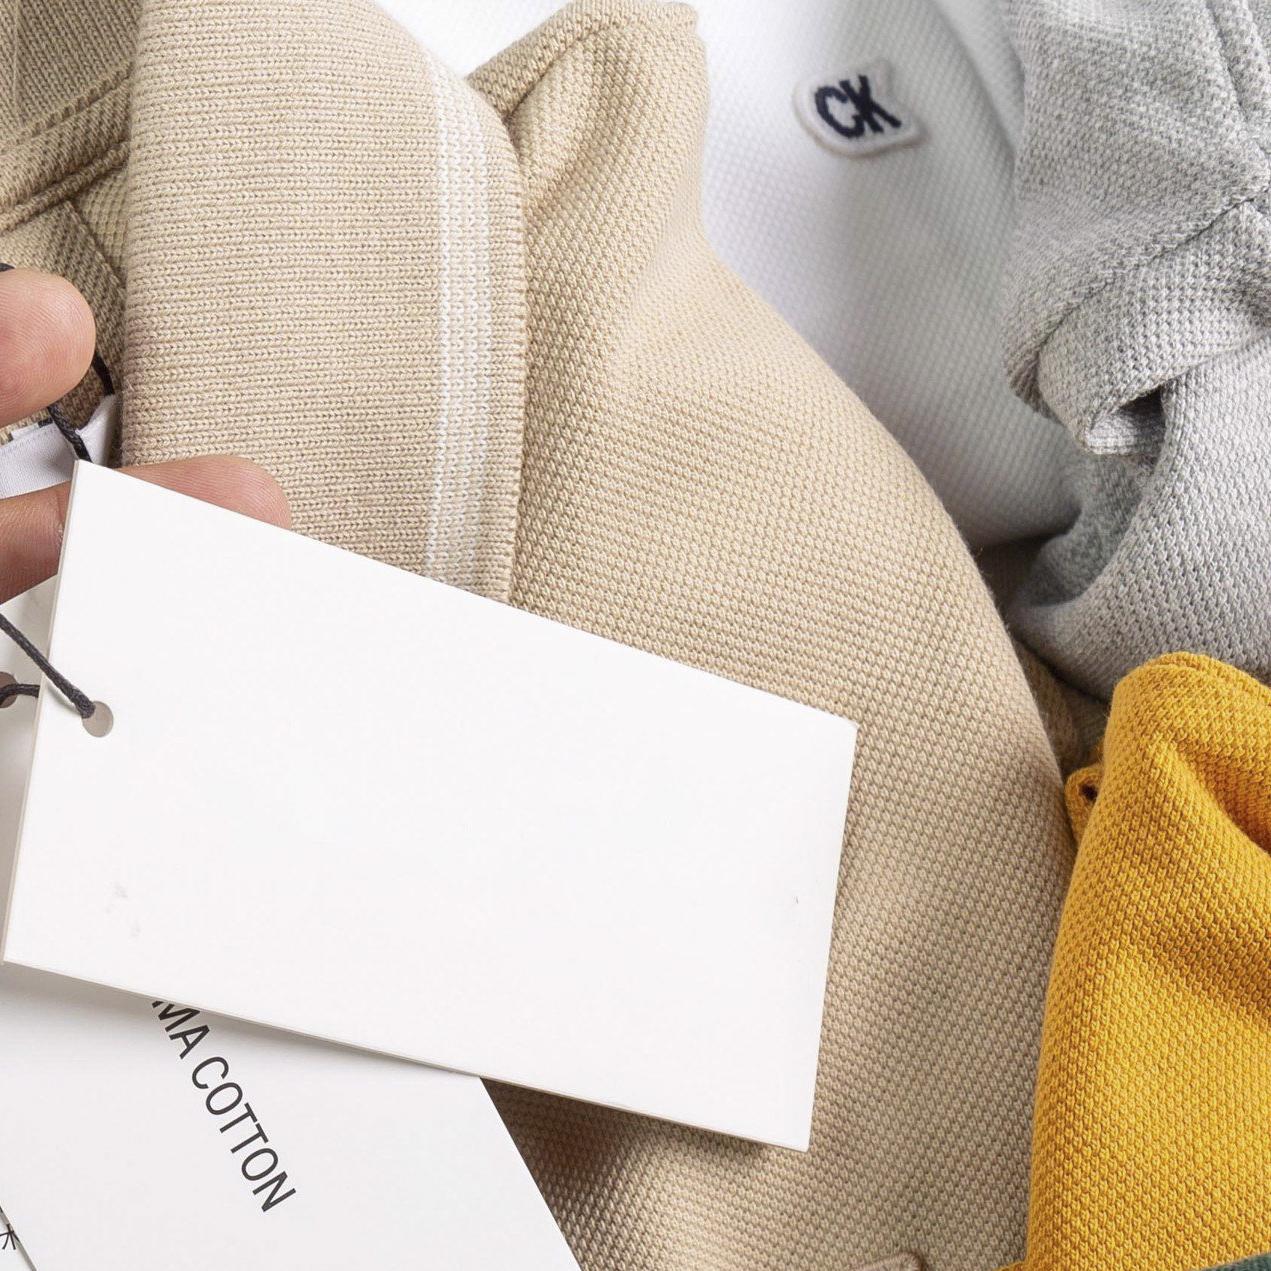 áo thun cotton big size ngoại cỡ